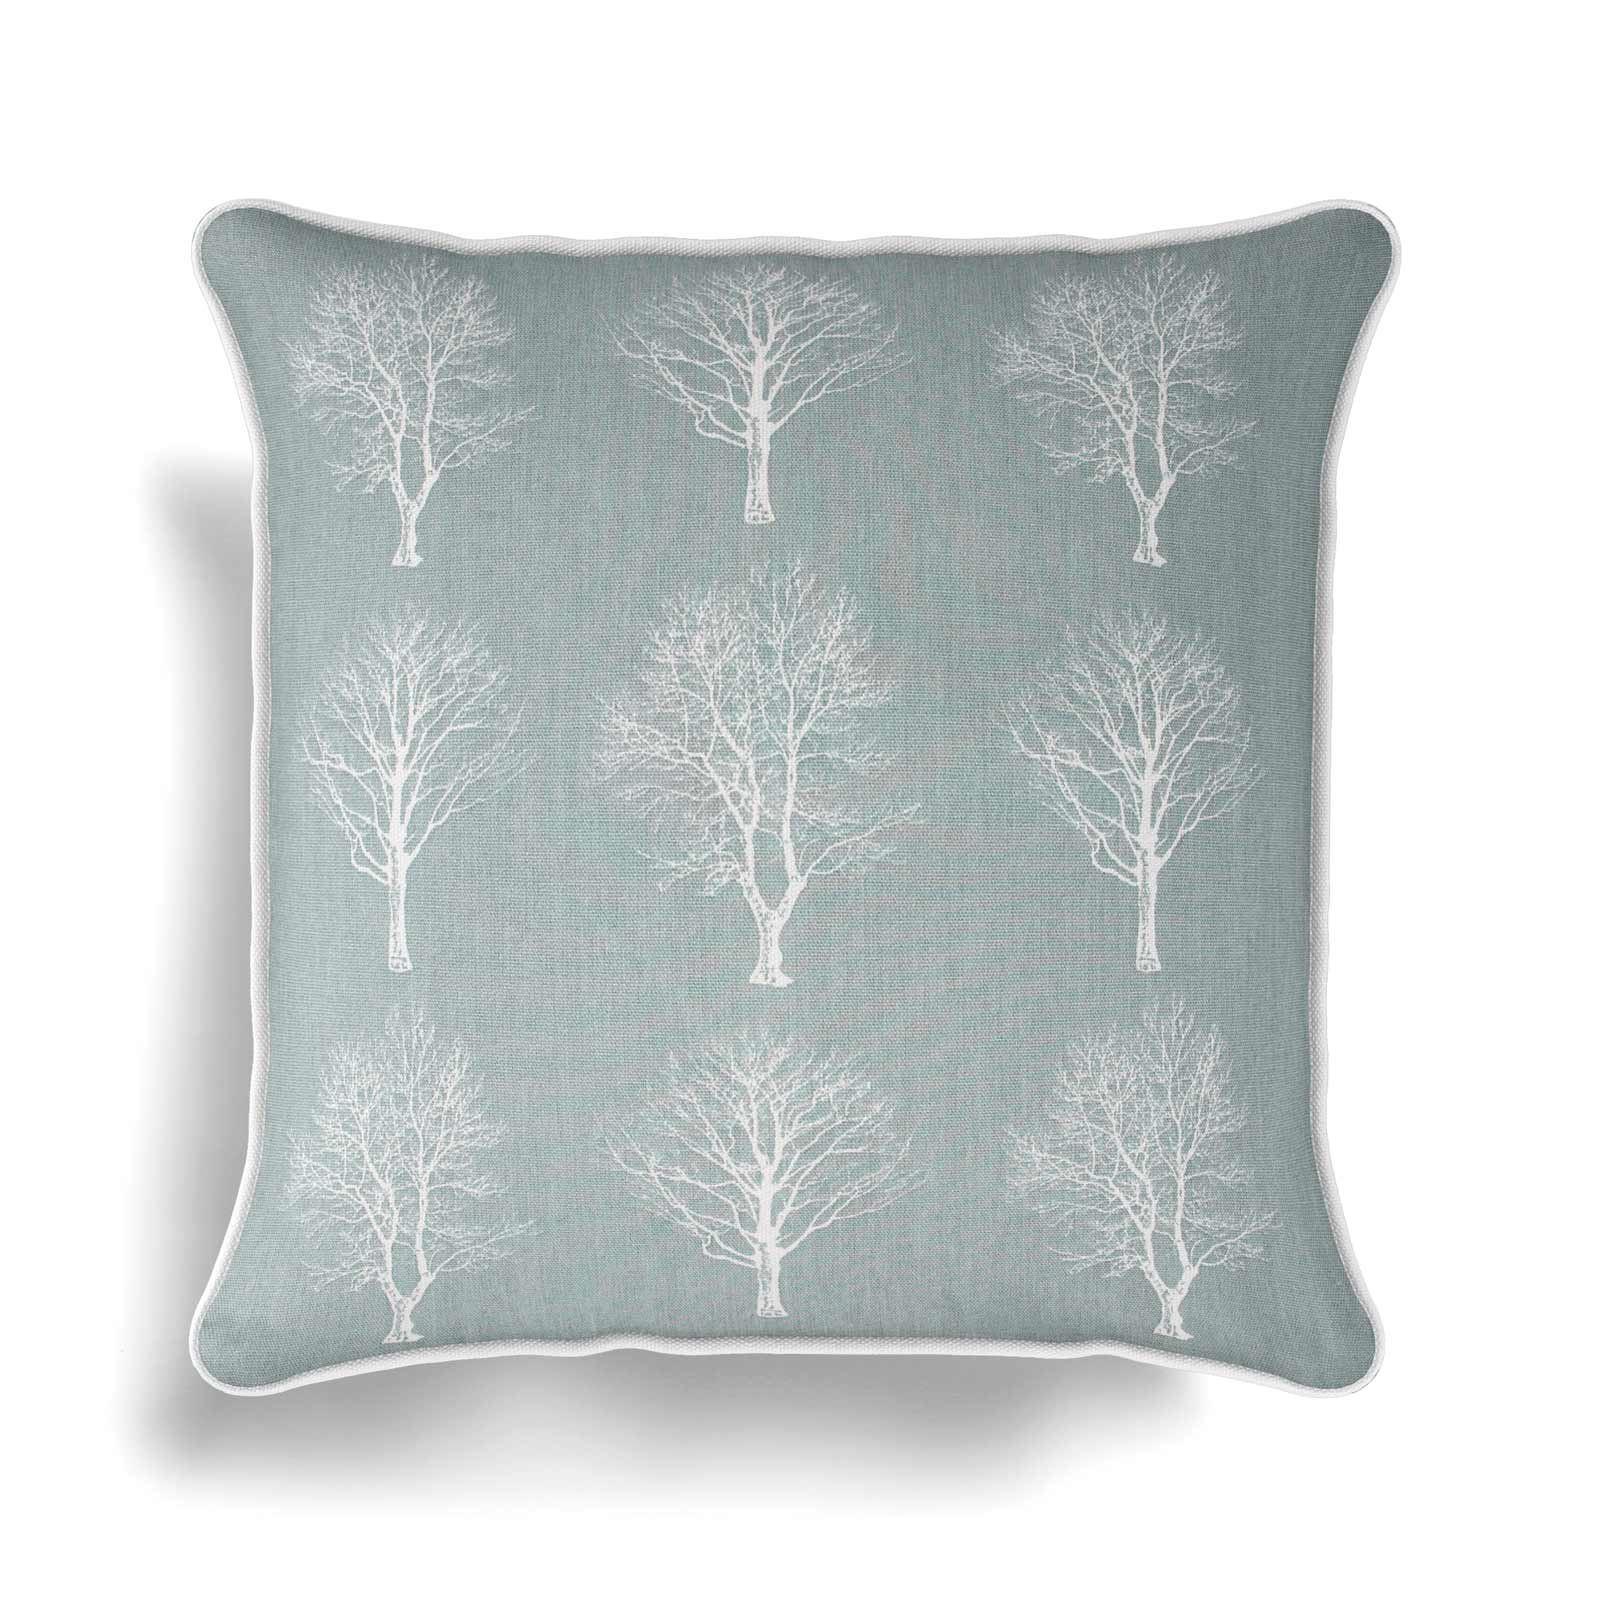 Teal-Blue-Duck-Egg-Cushion-Covers-18-034-x18-034-45cm-x-45cm-Luxury-Cover thumbnail 52